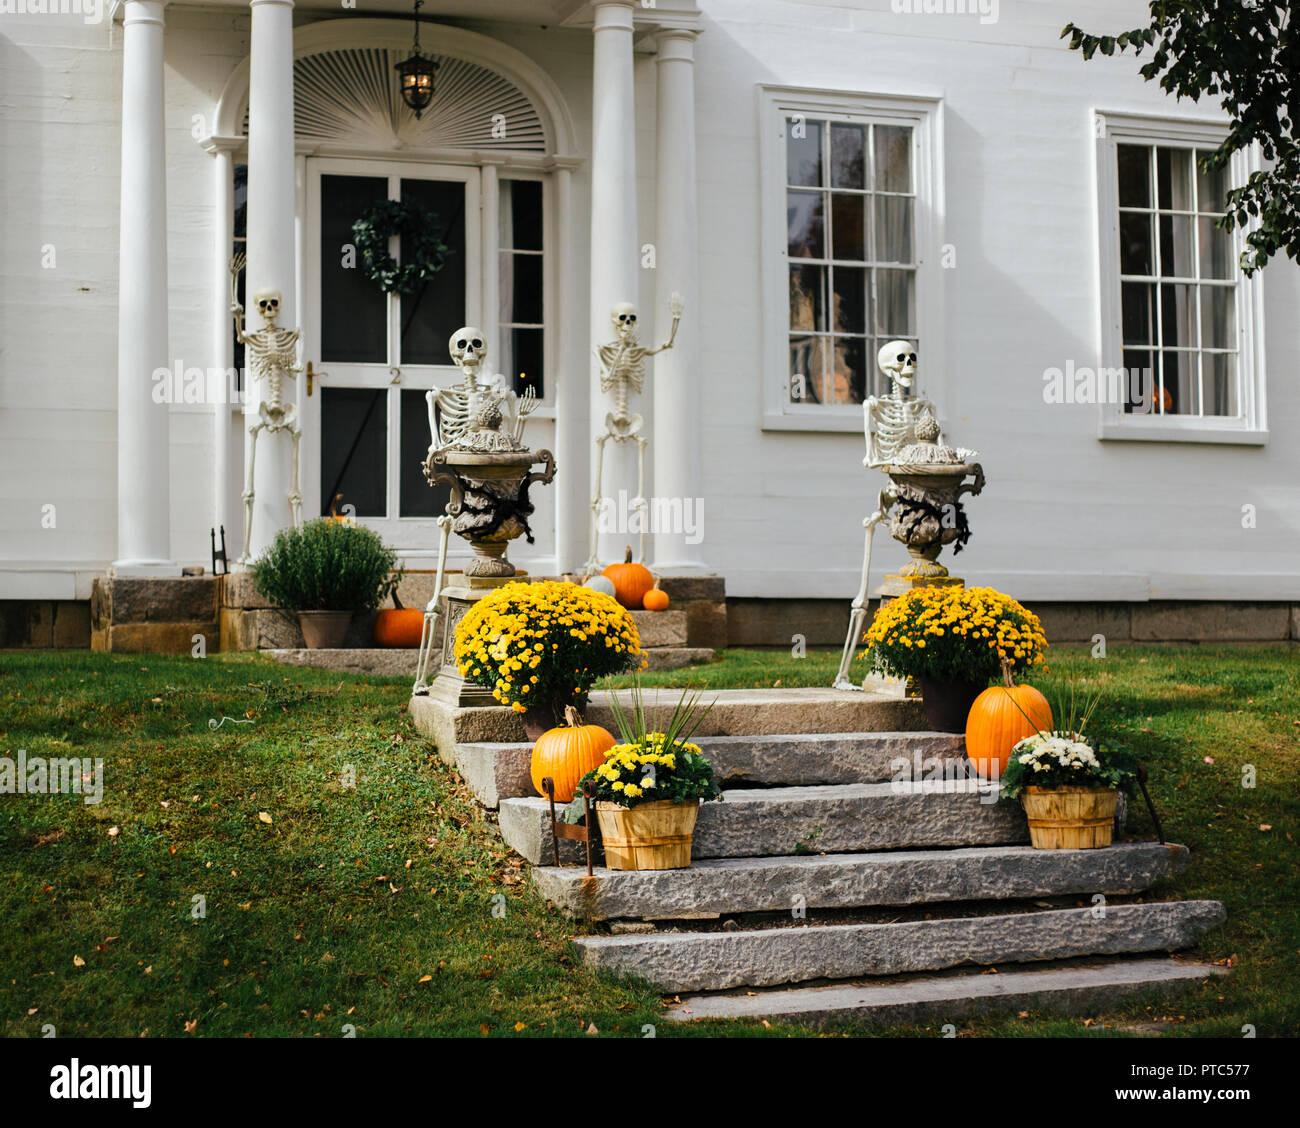 Halloween Yard Decorations Ideas High Resolution Stock